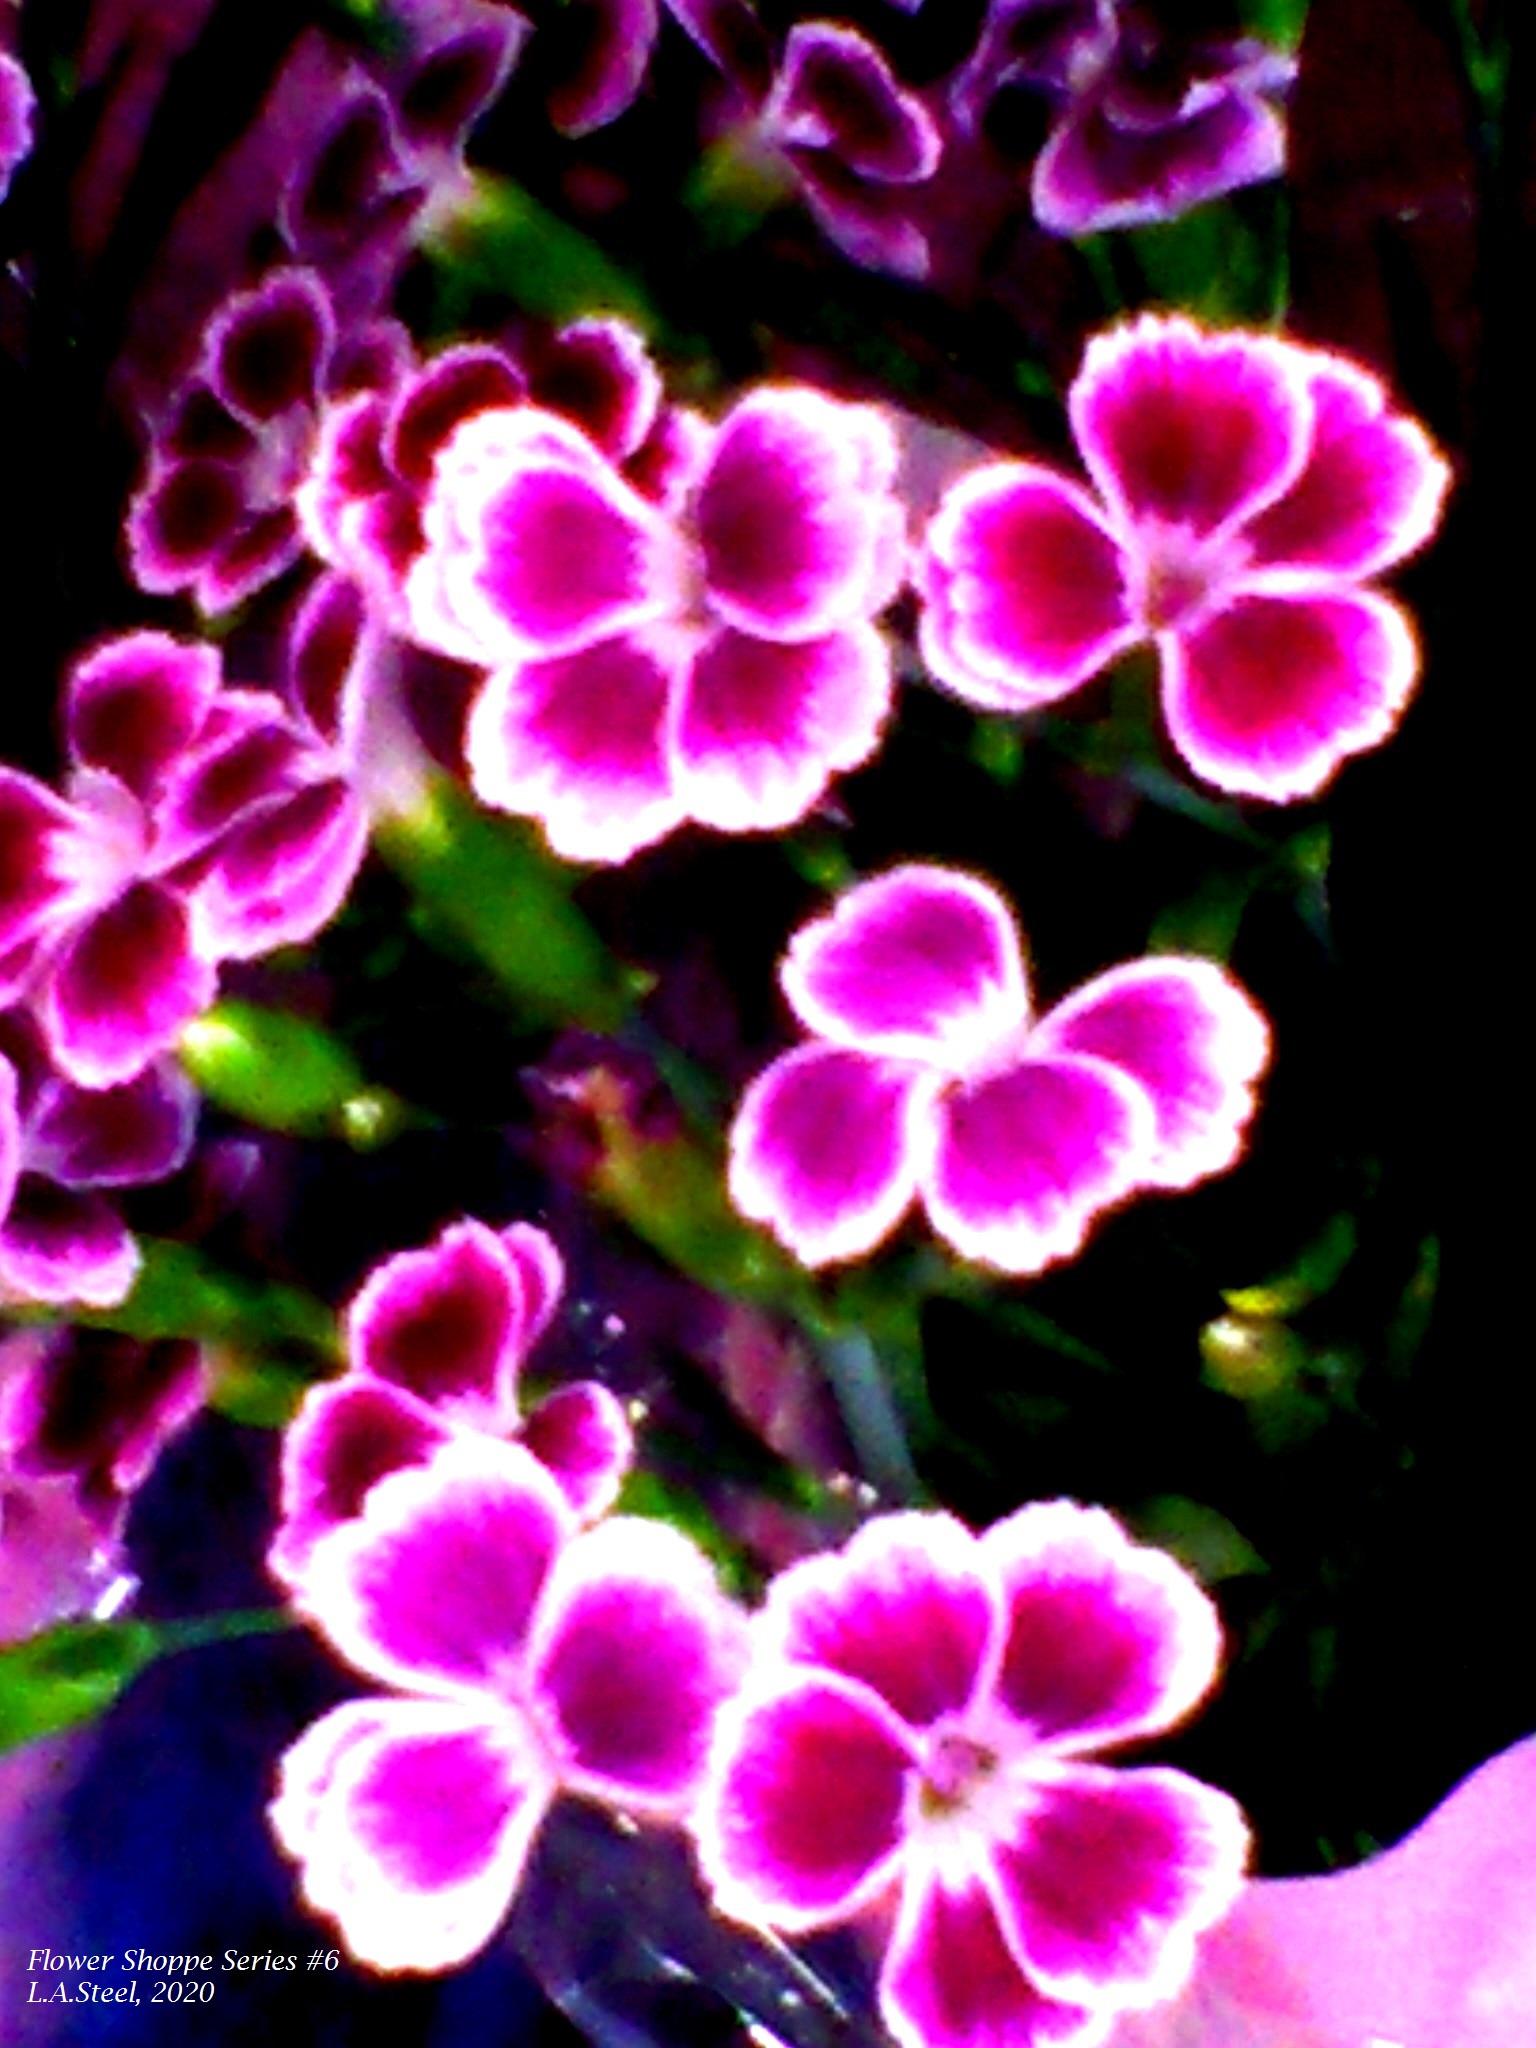 flower shoppe series #6 7 2020